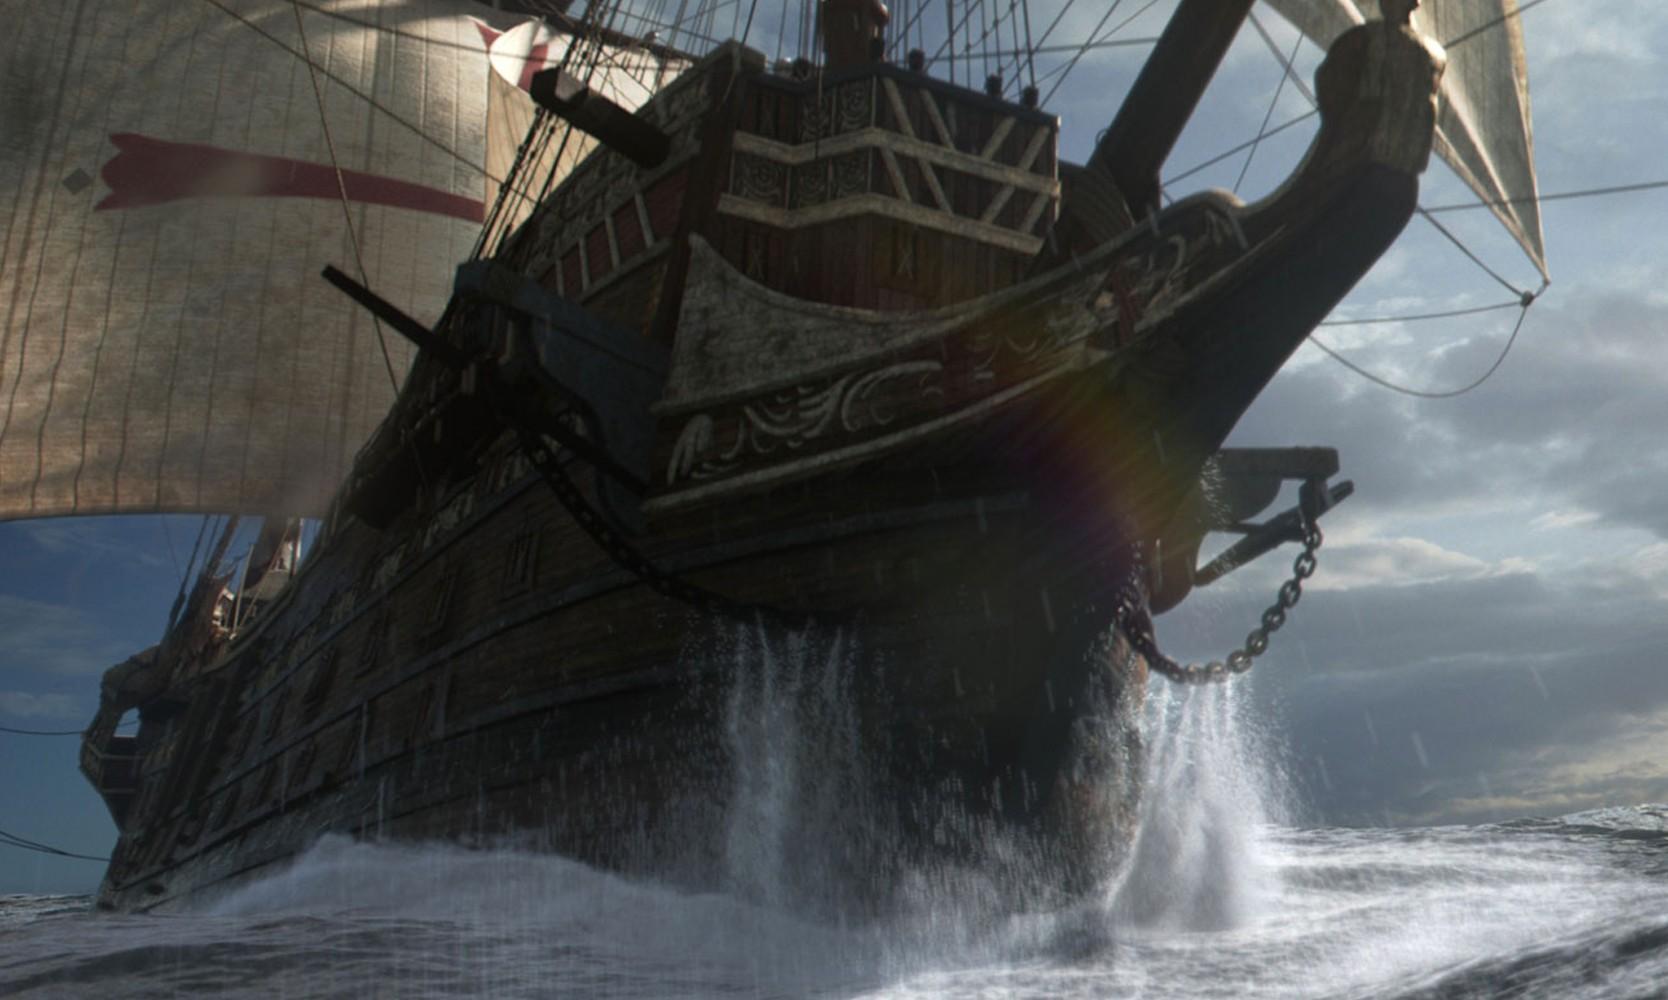 black sails 2 2